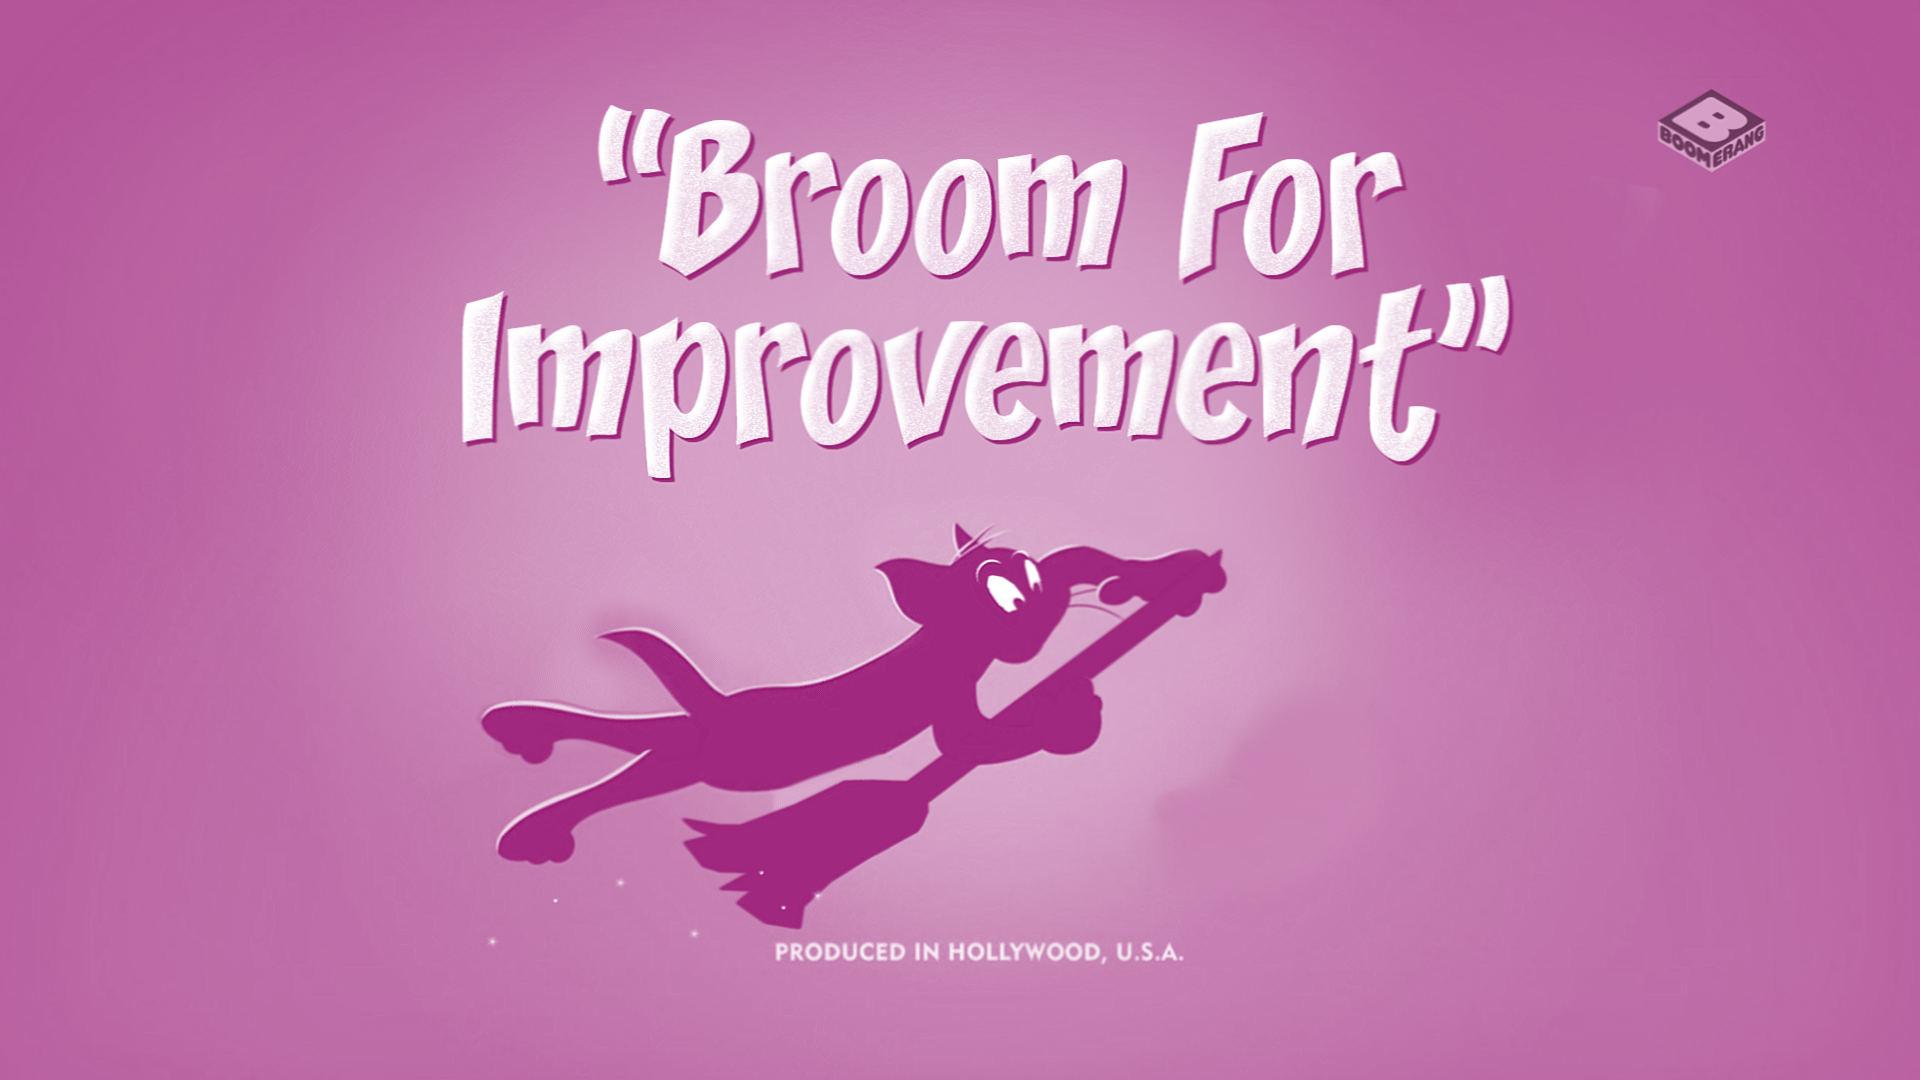 Broom for Improvement